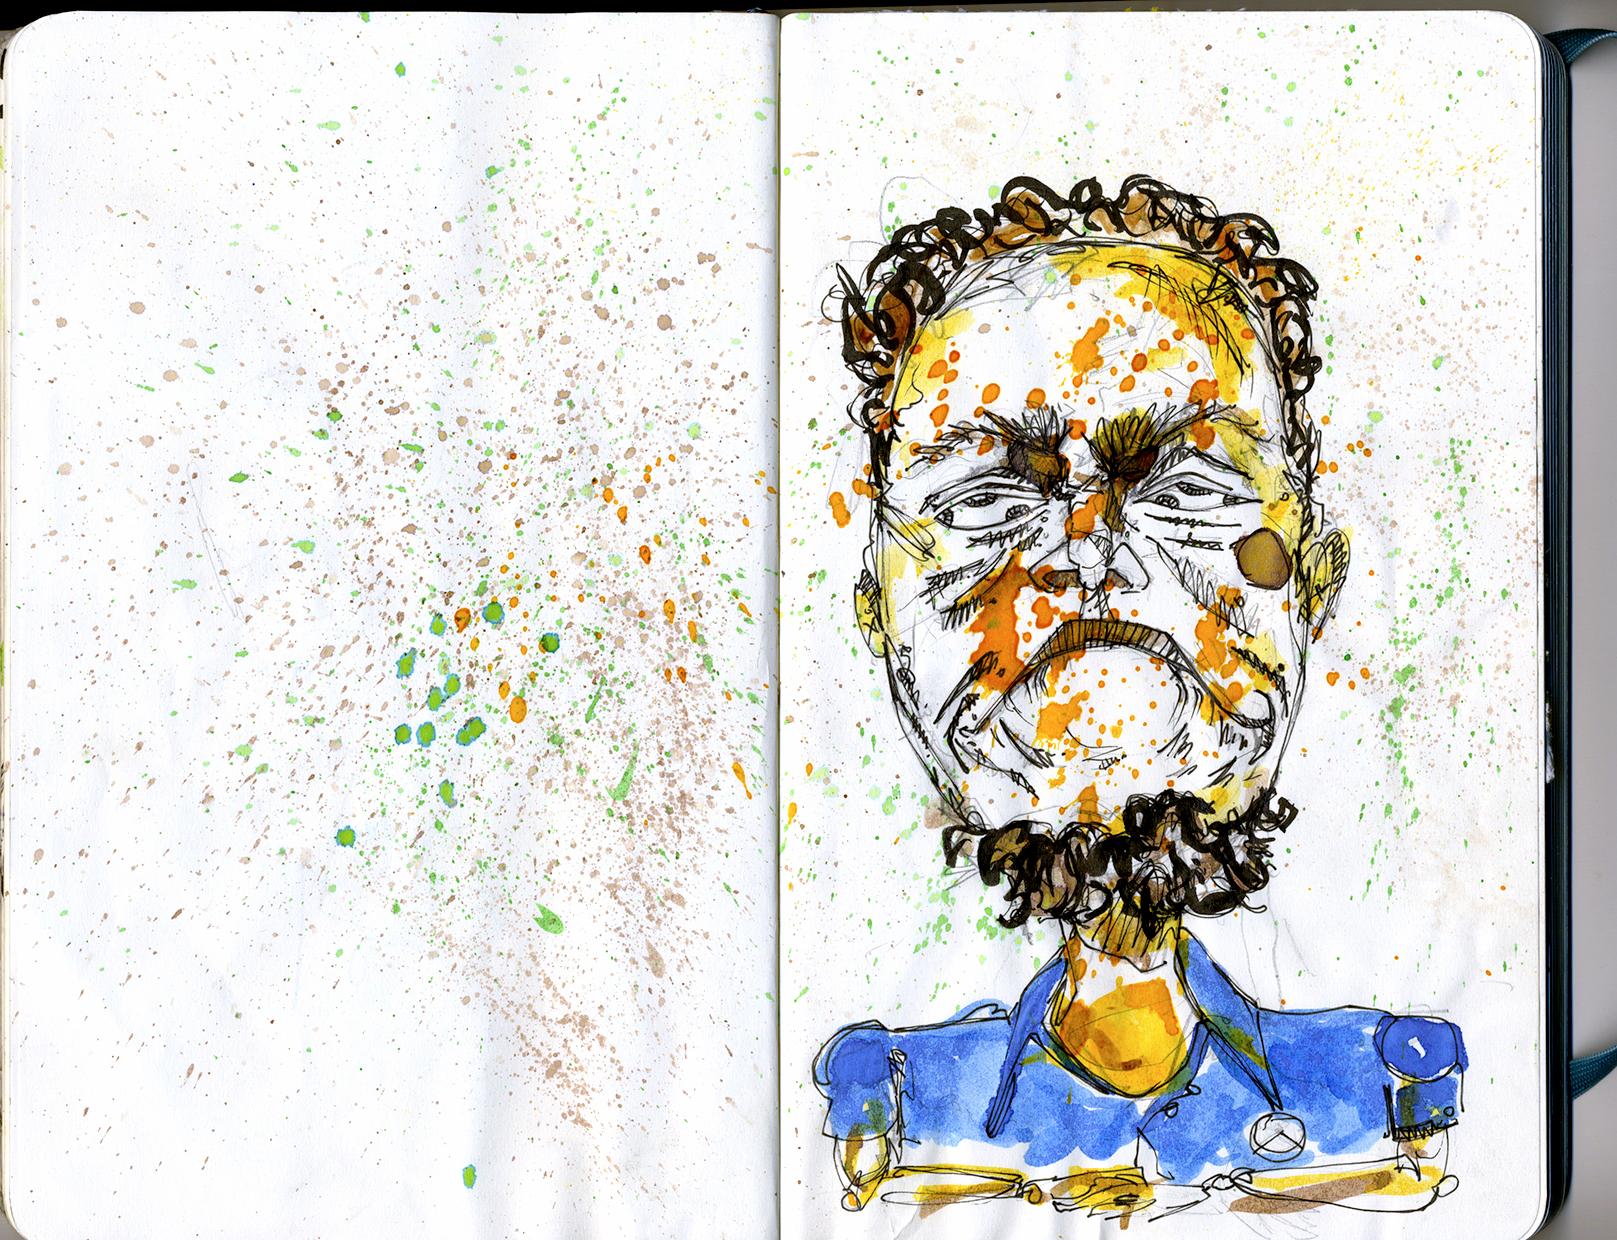 Self Portrait #1.jpg